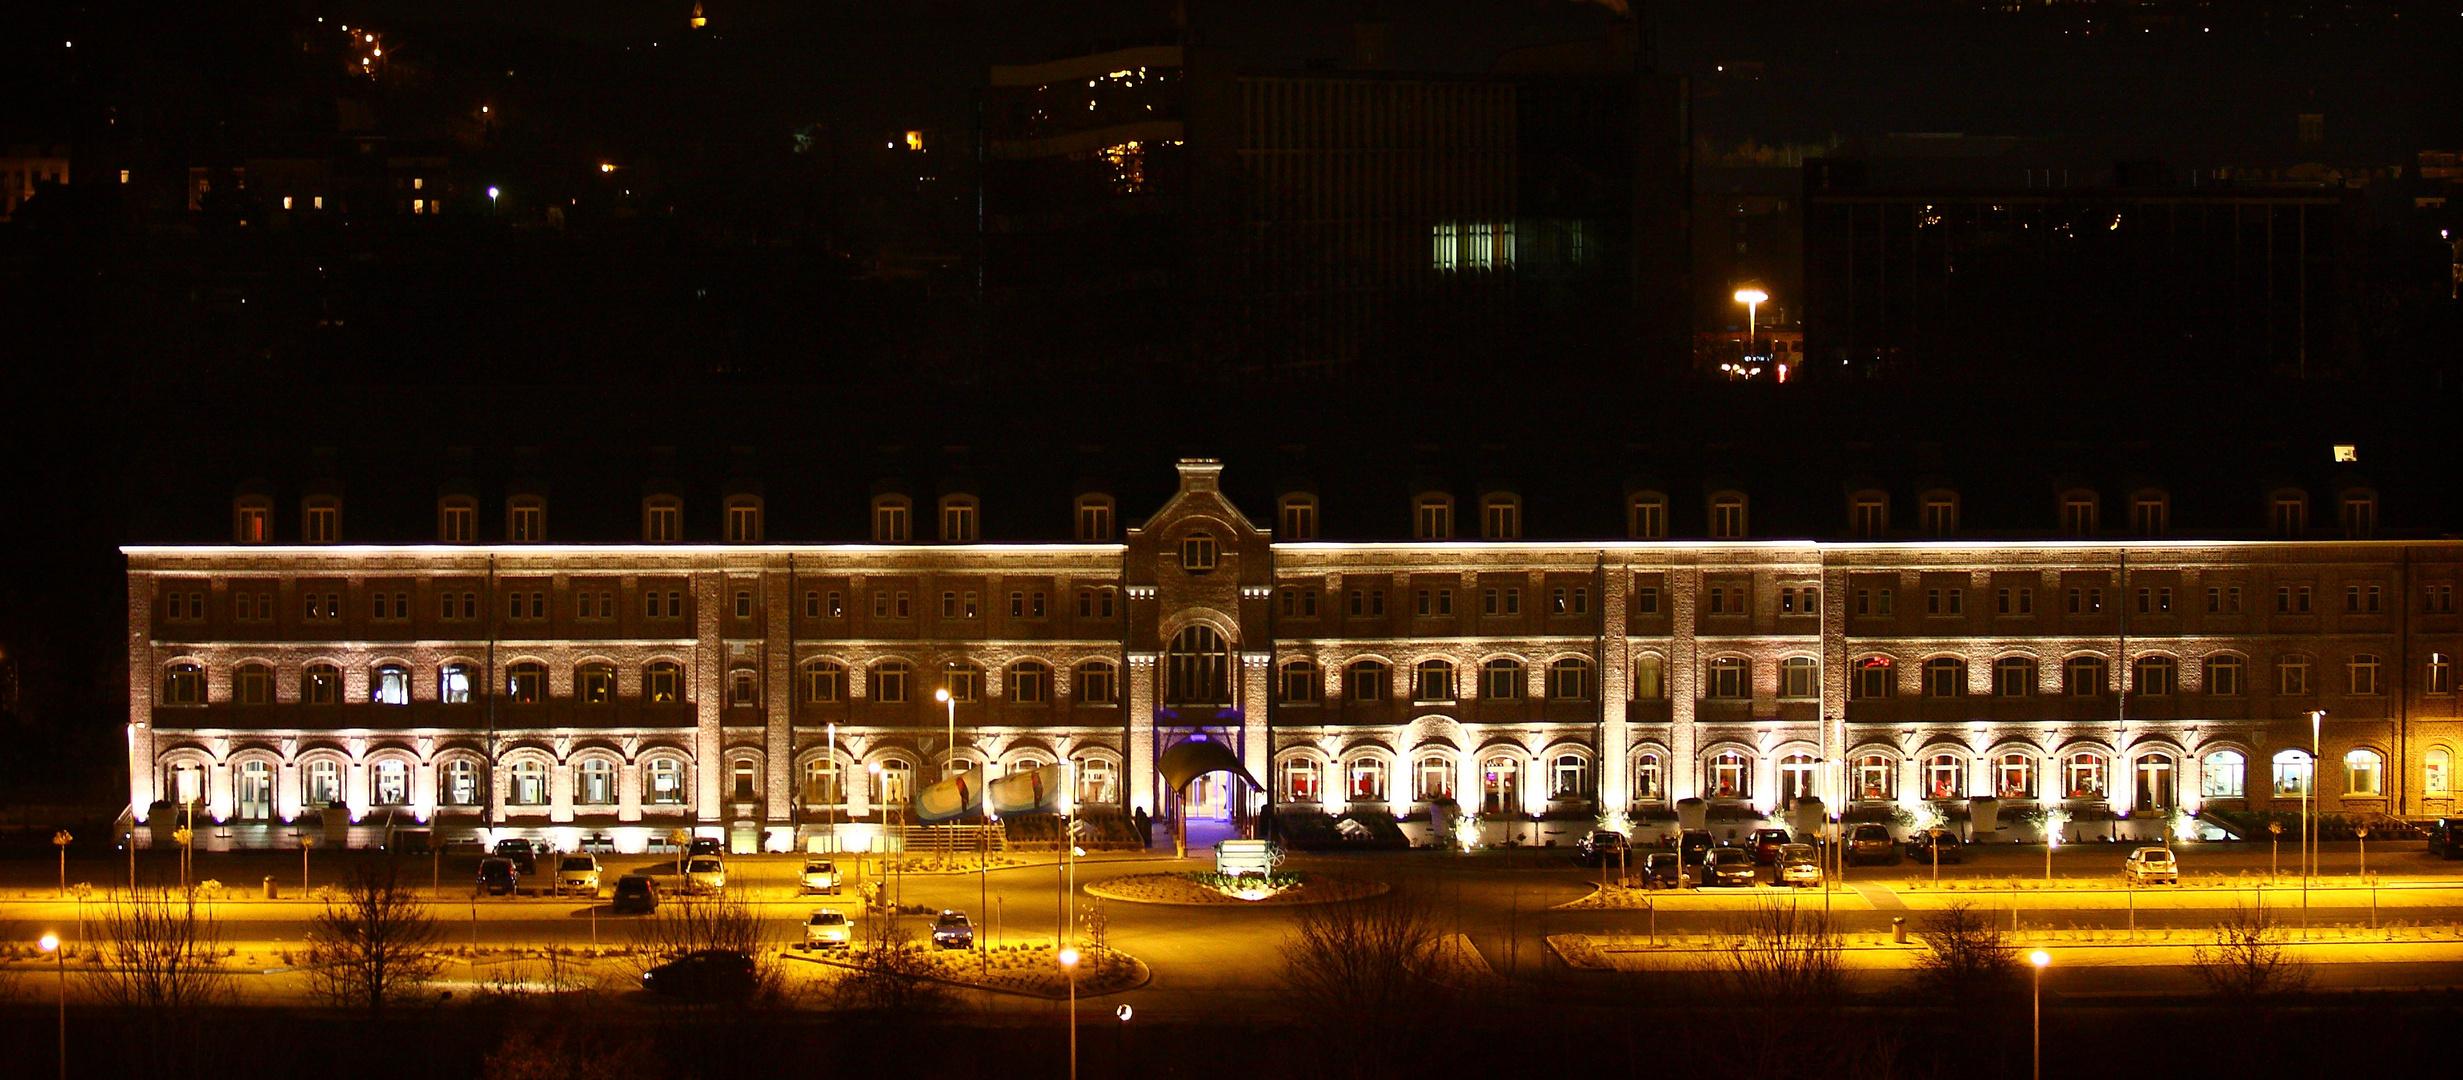 L'ex-gare devenue grand hôtel